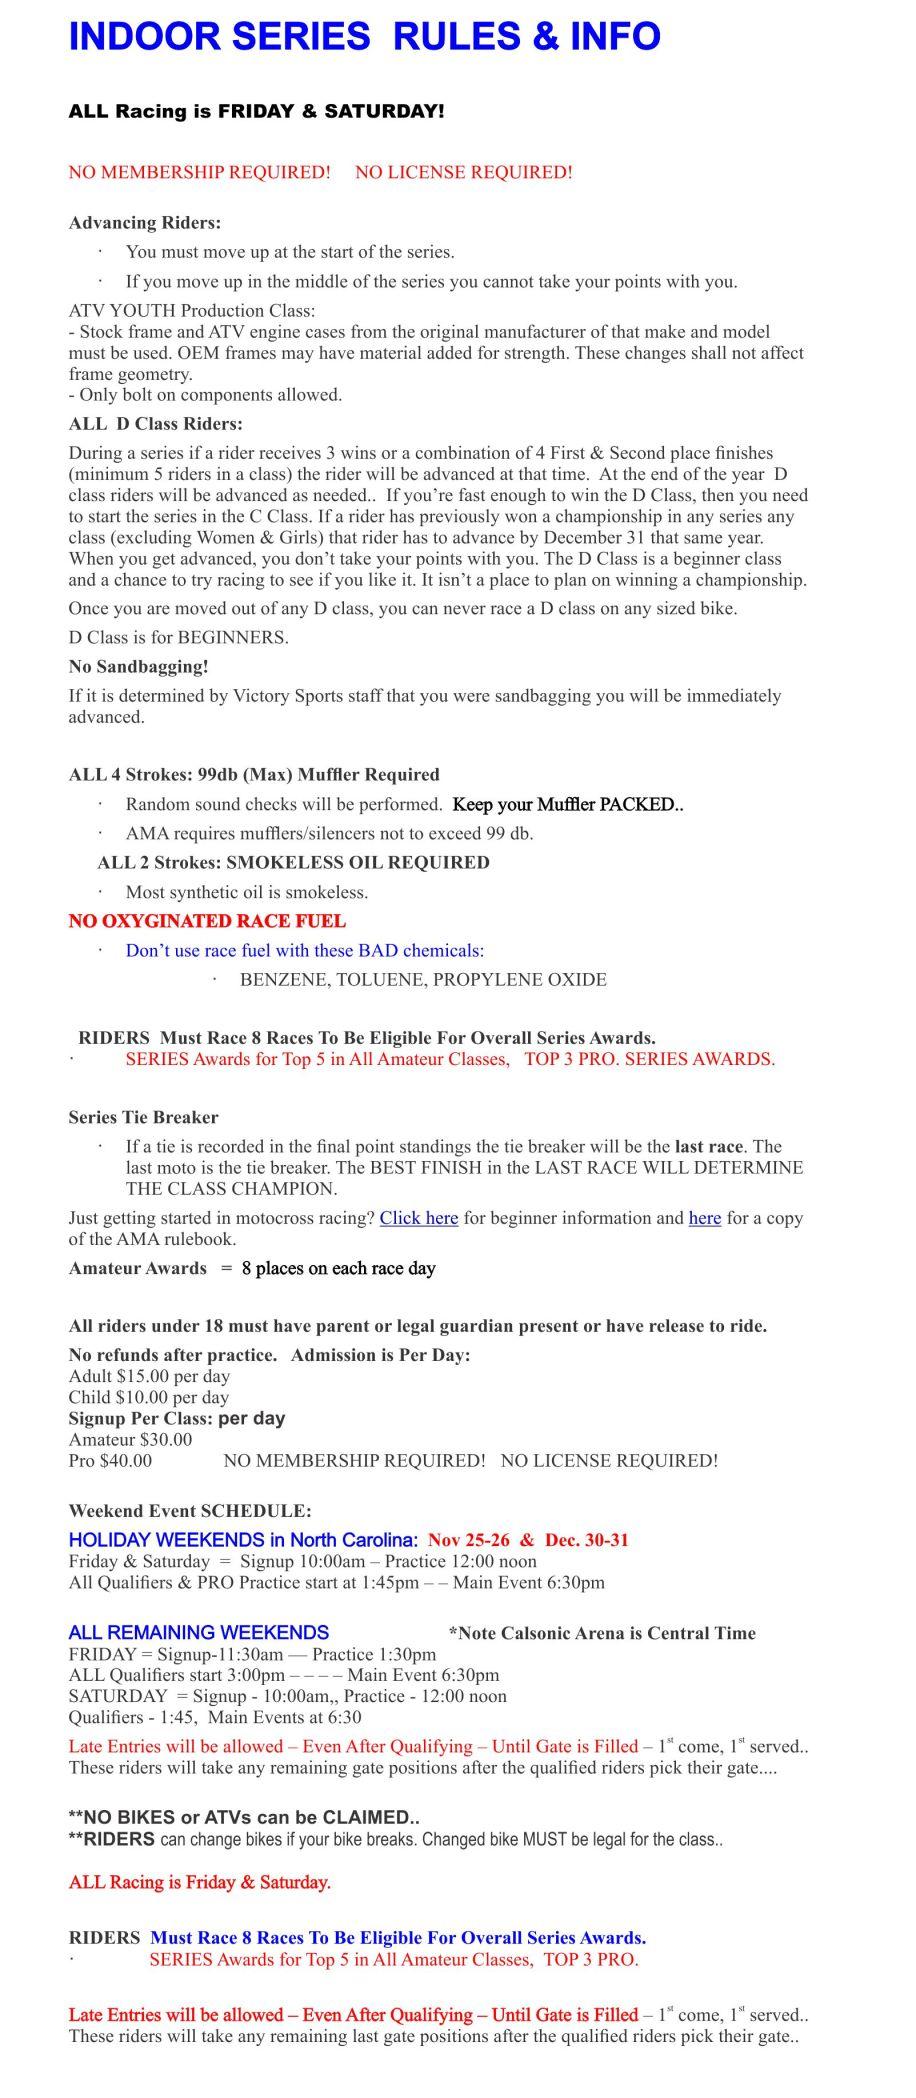 2016-17 Supplemental Rules - Info